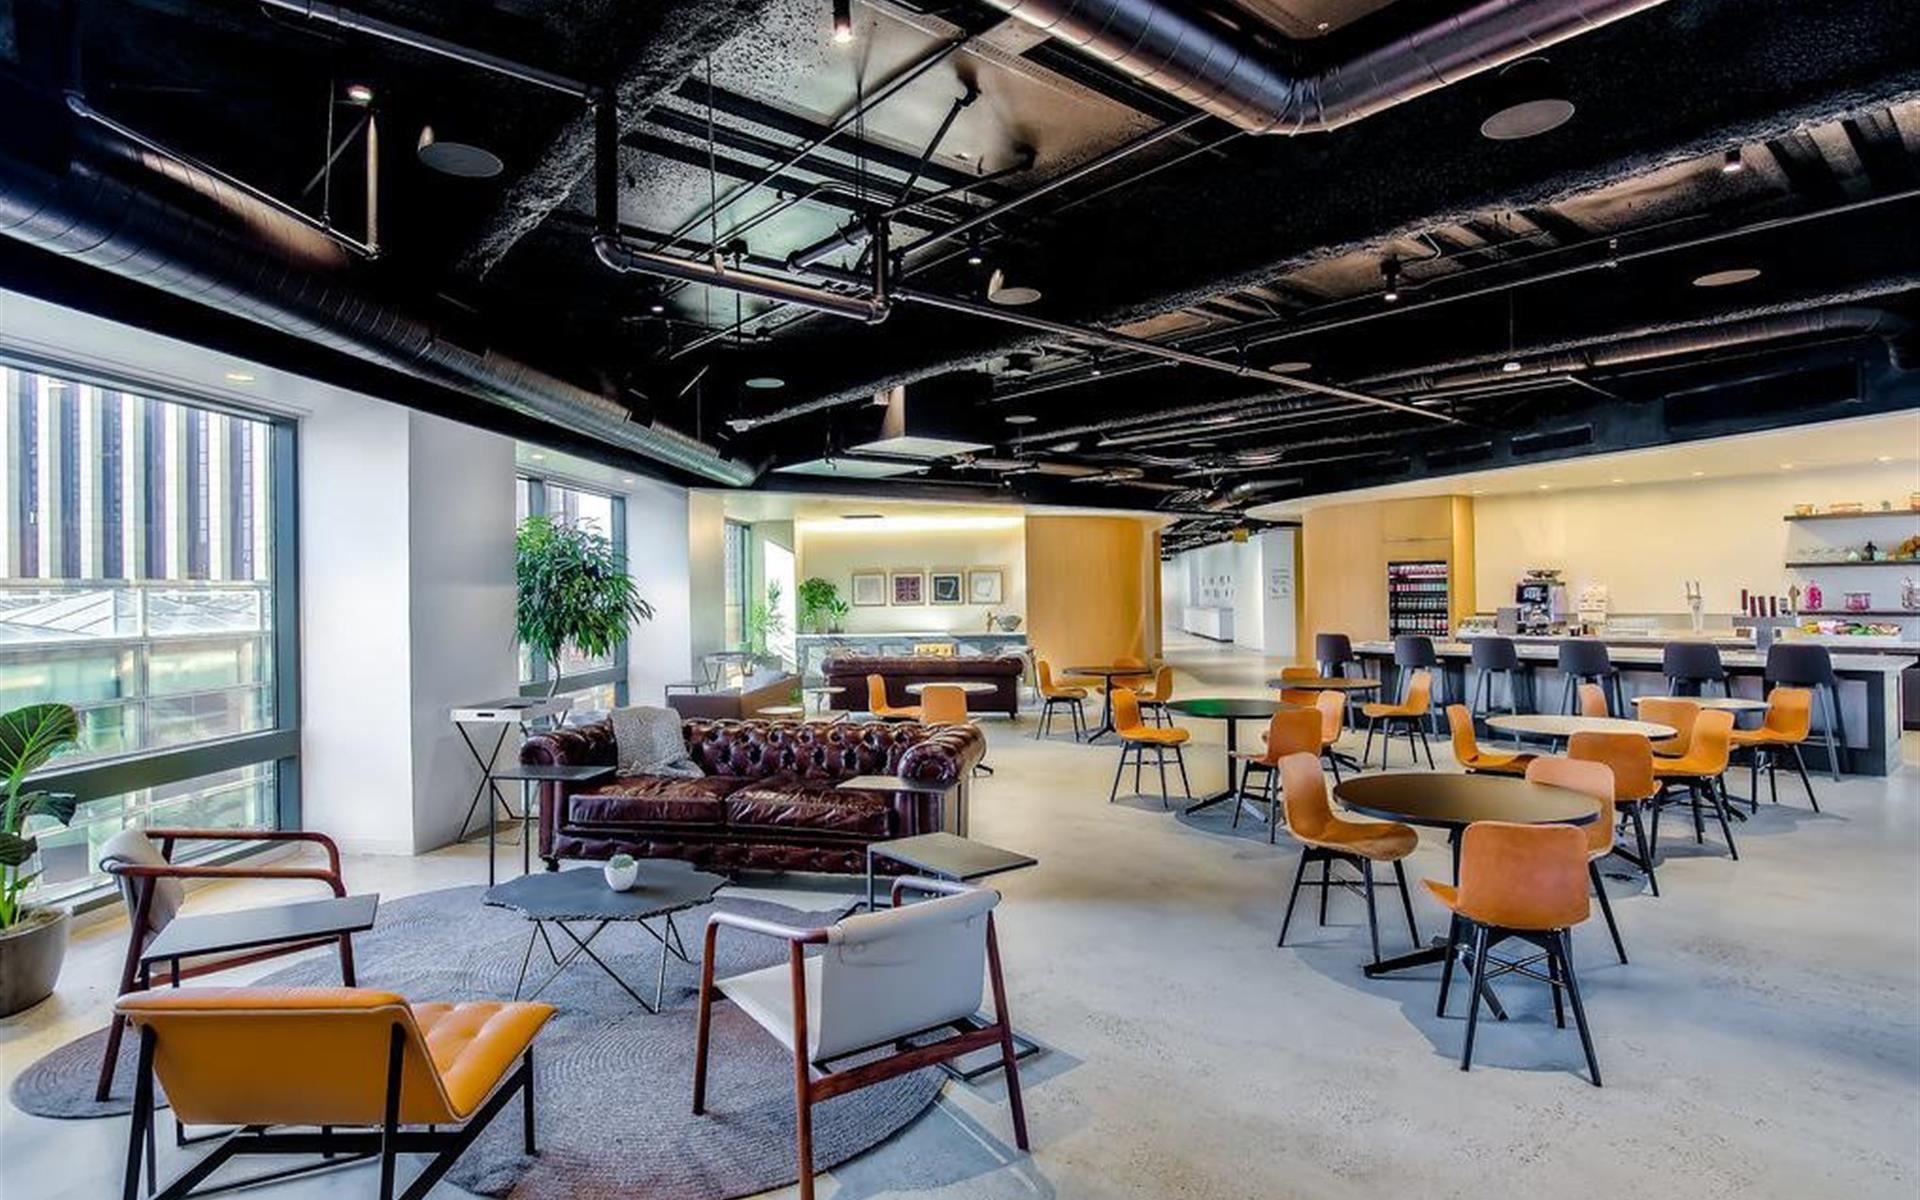 Convene at Wells Fargo Center - Open Membership